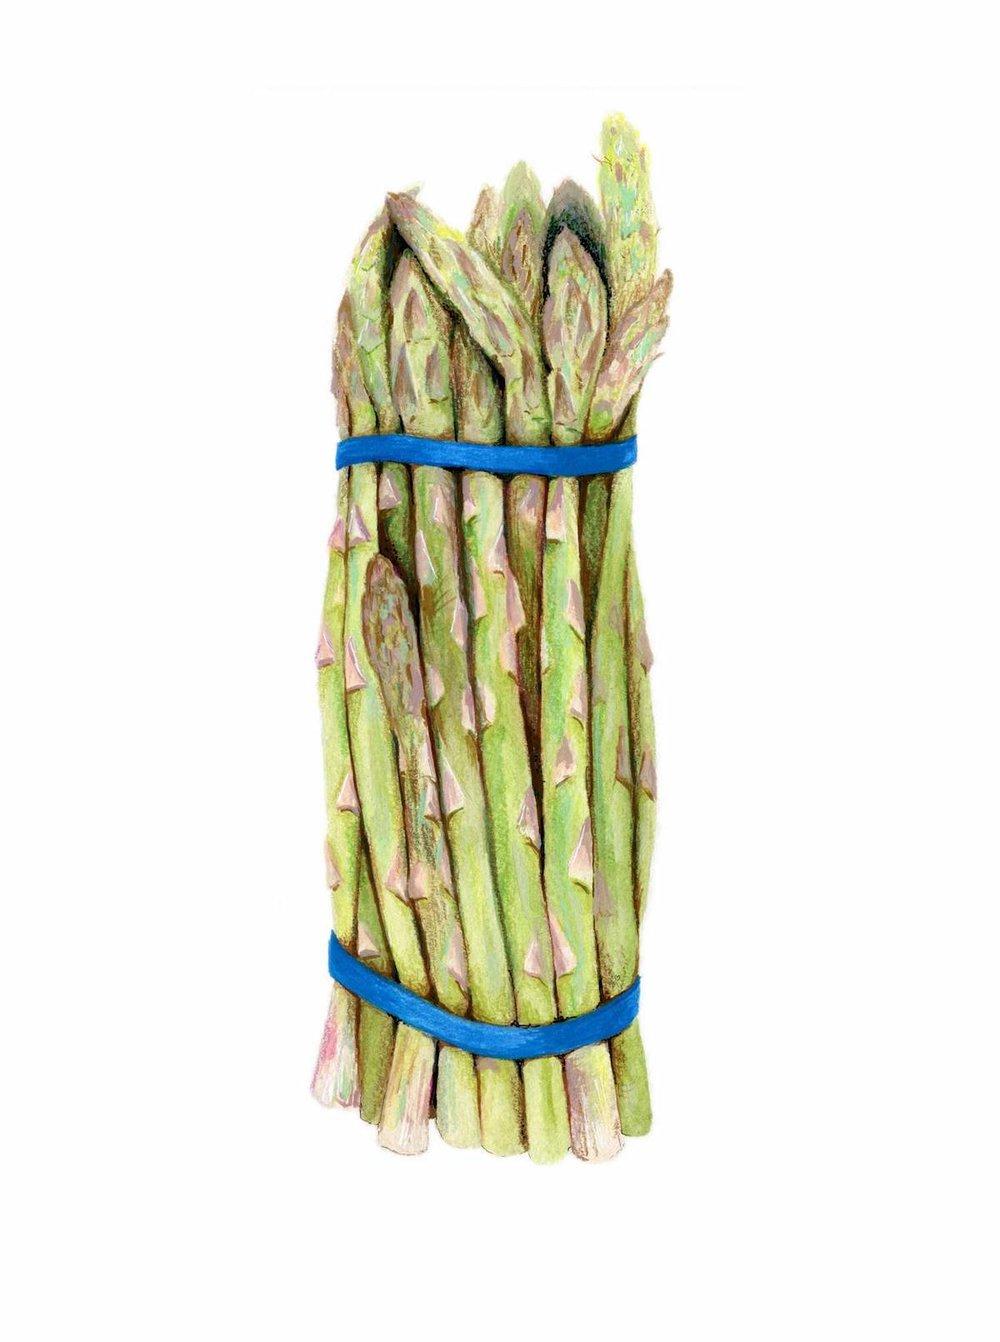 Asparagus Illustration